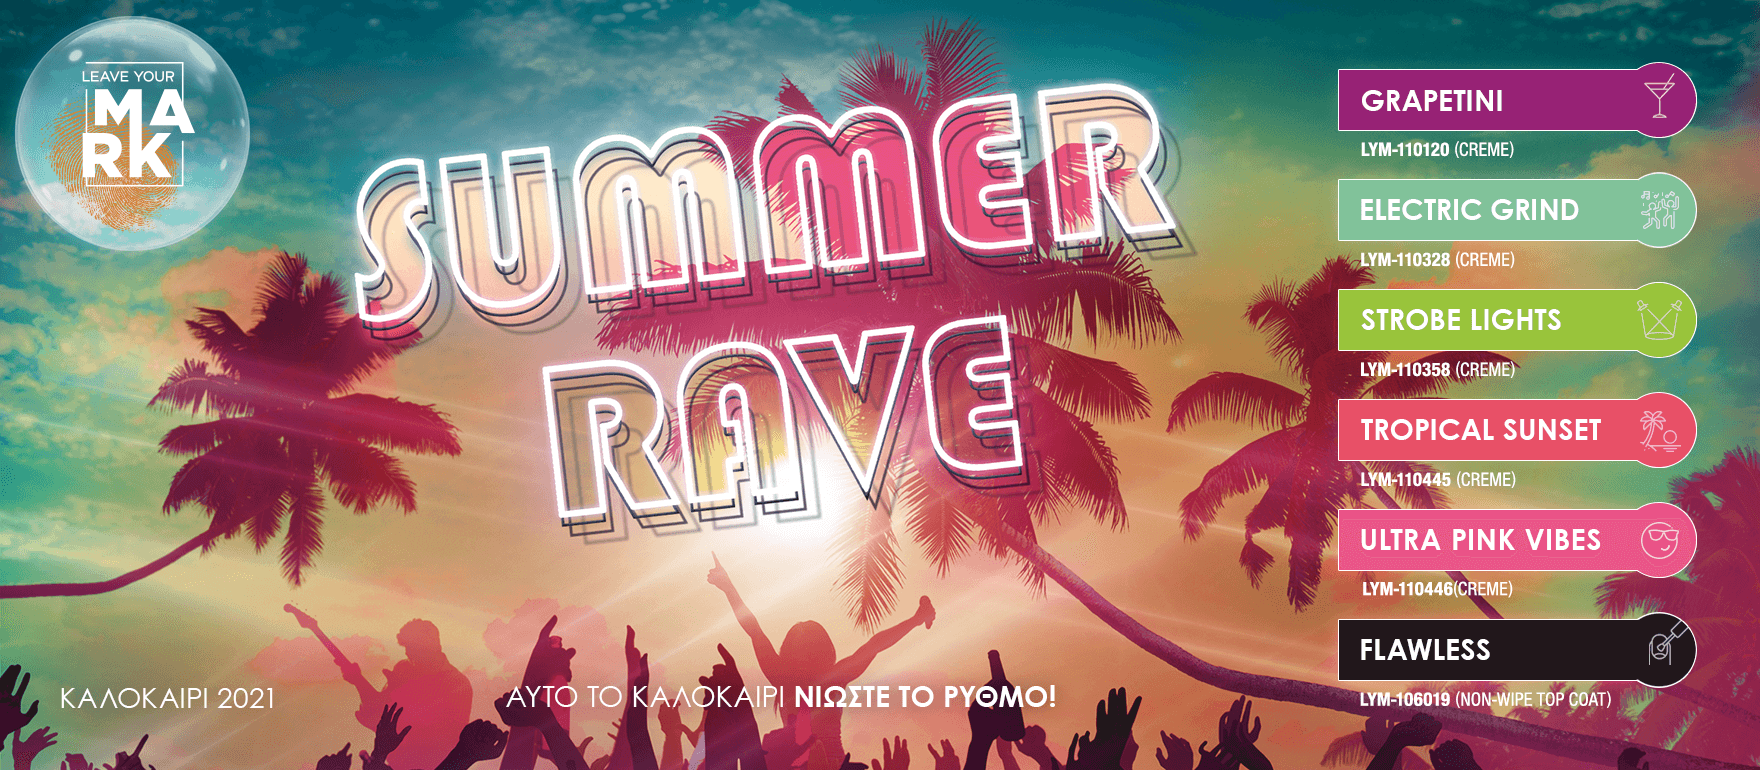 LYM - Summer 2021 - Summer Rave